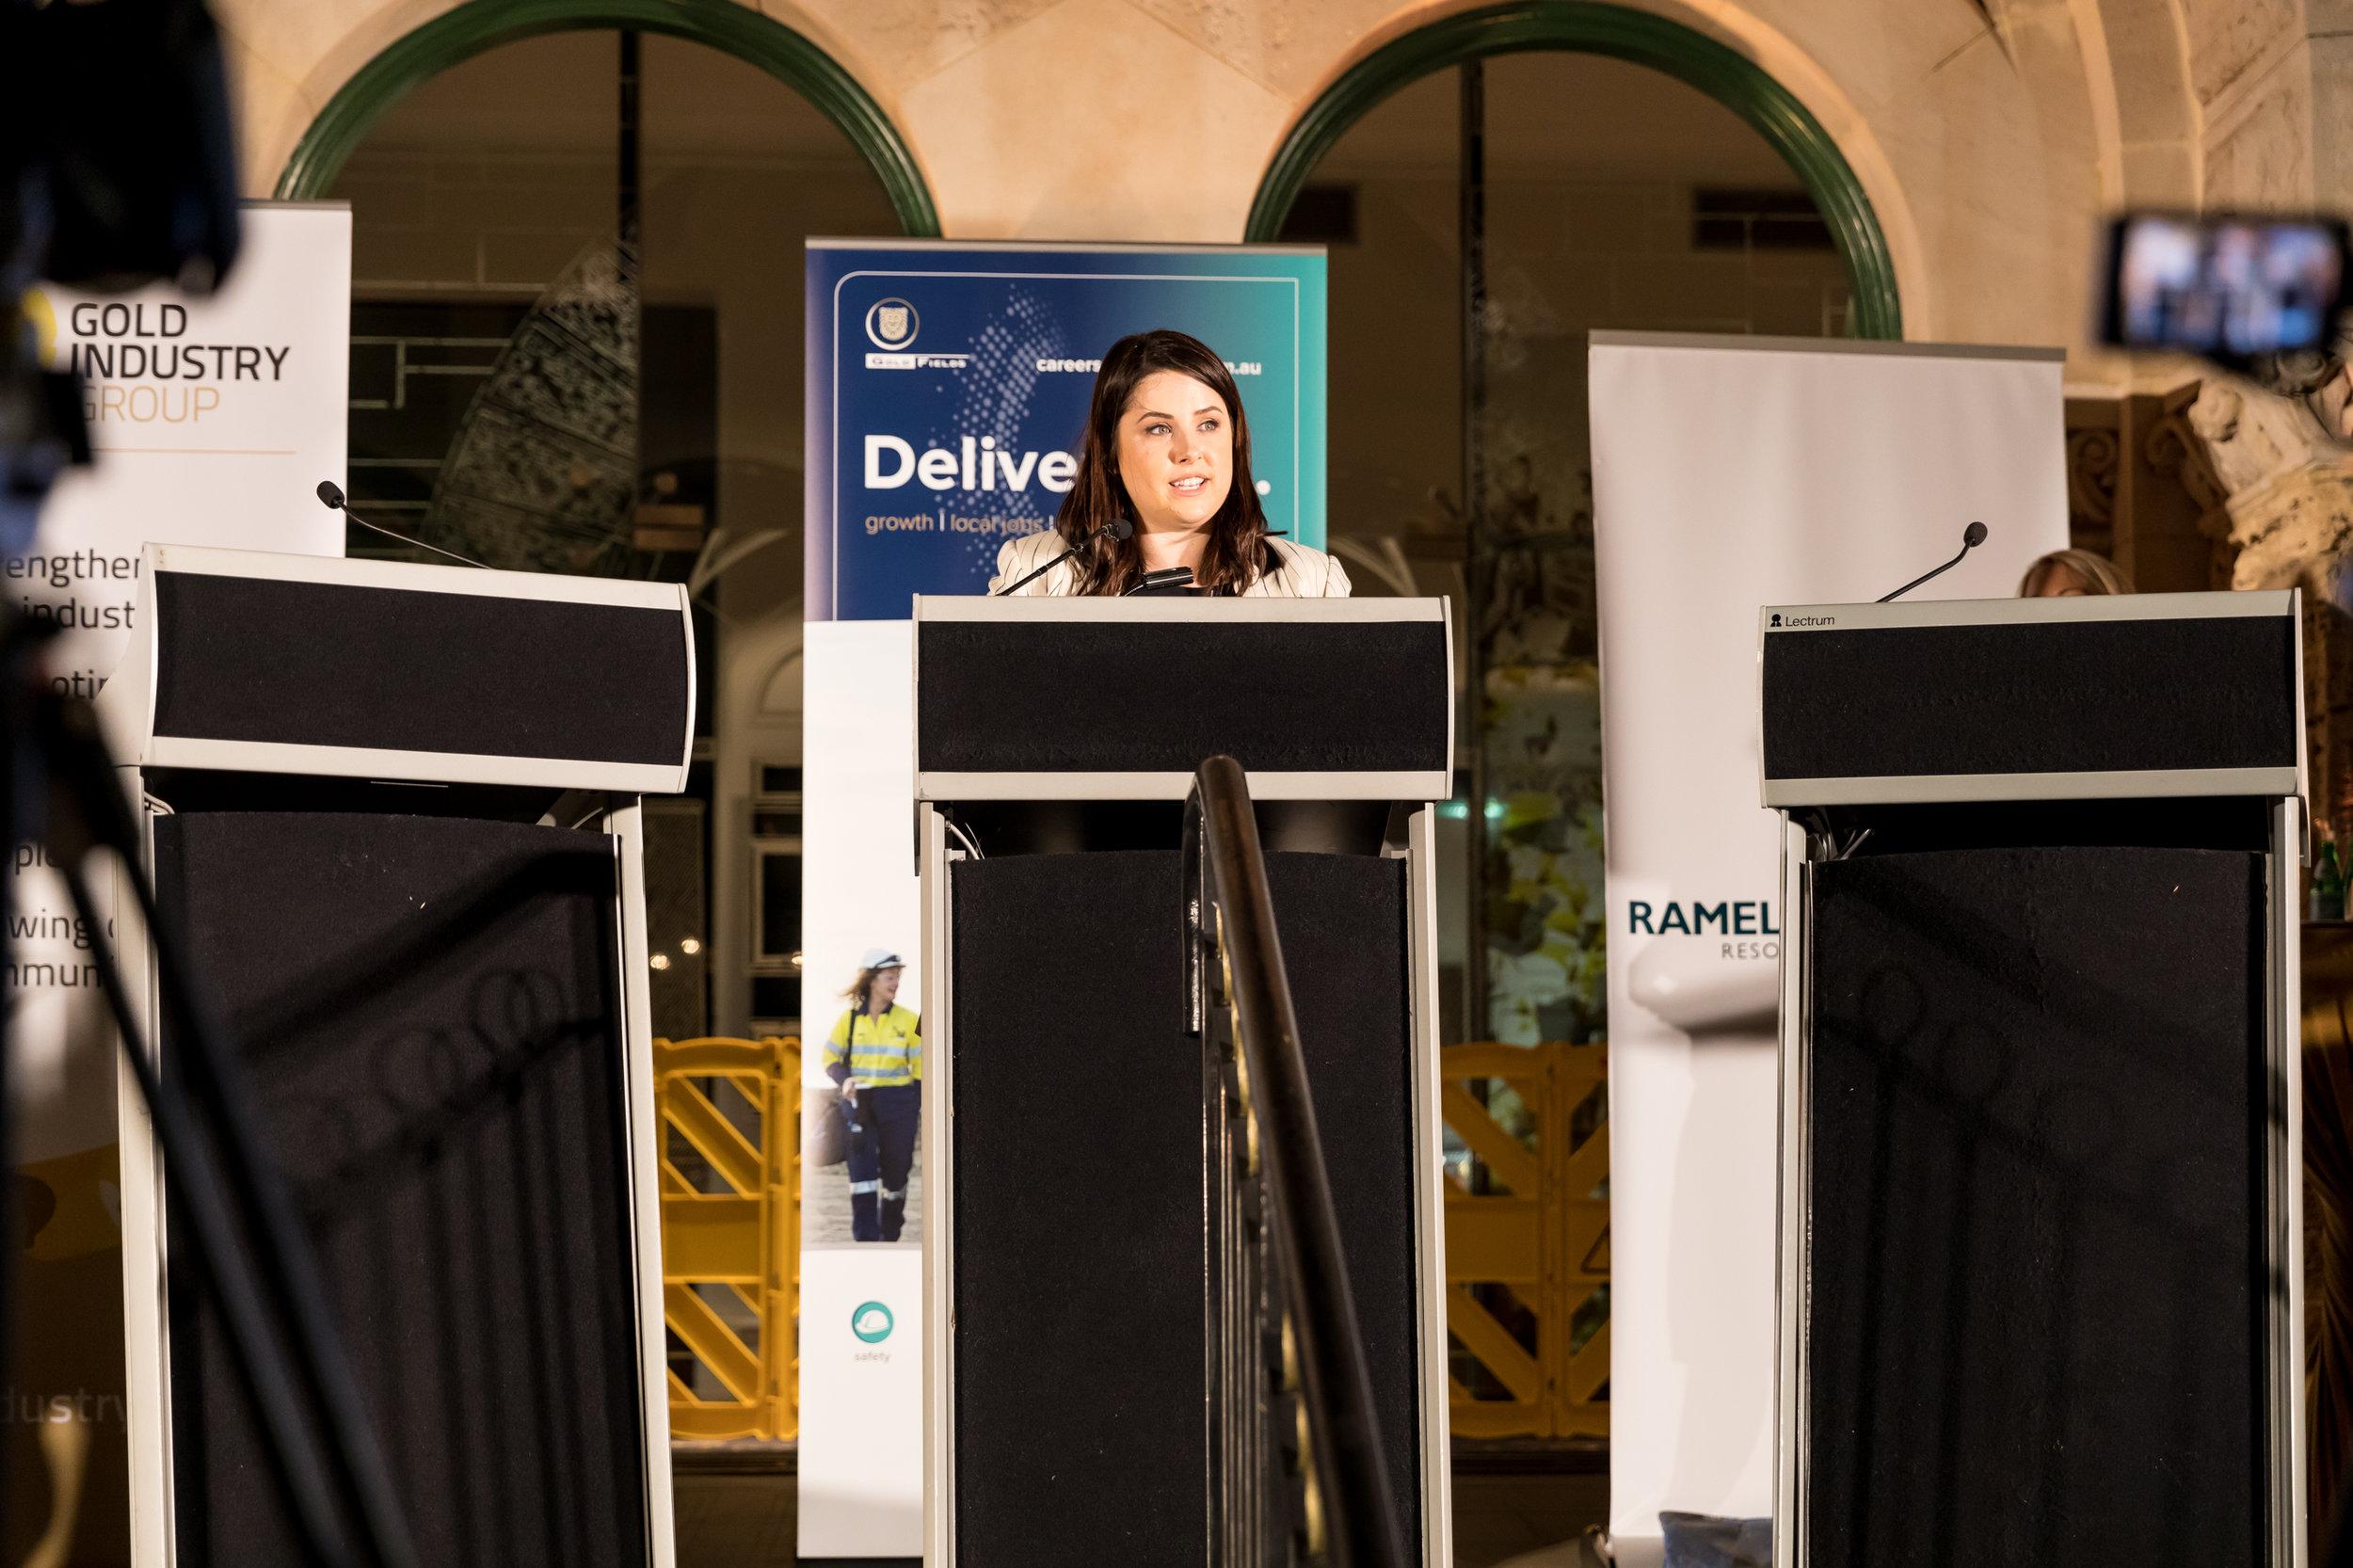 Great Debate Perth Mint High Res 1403.jpg